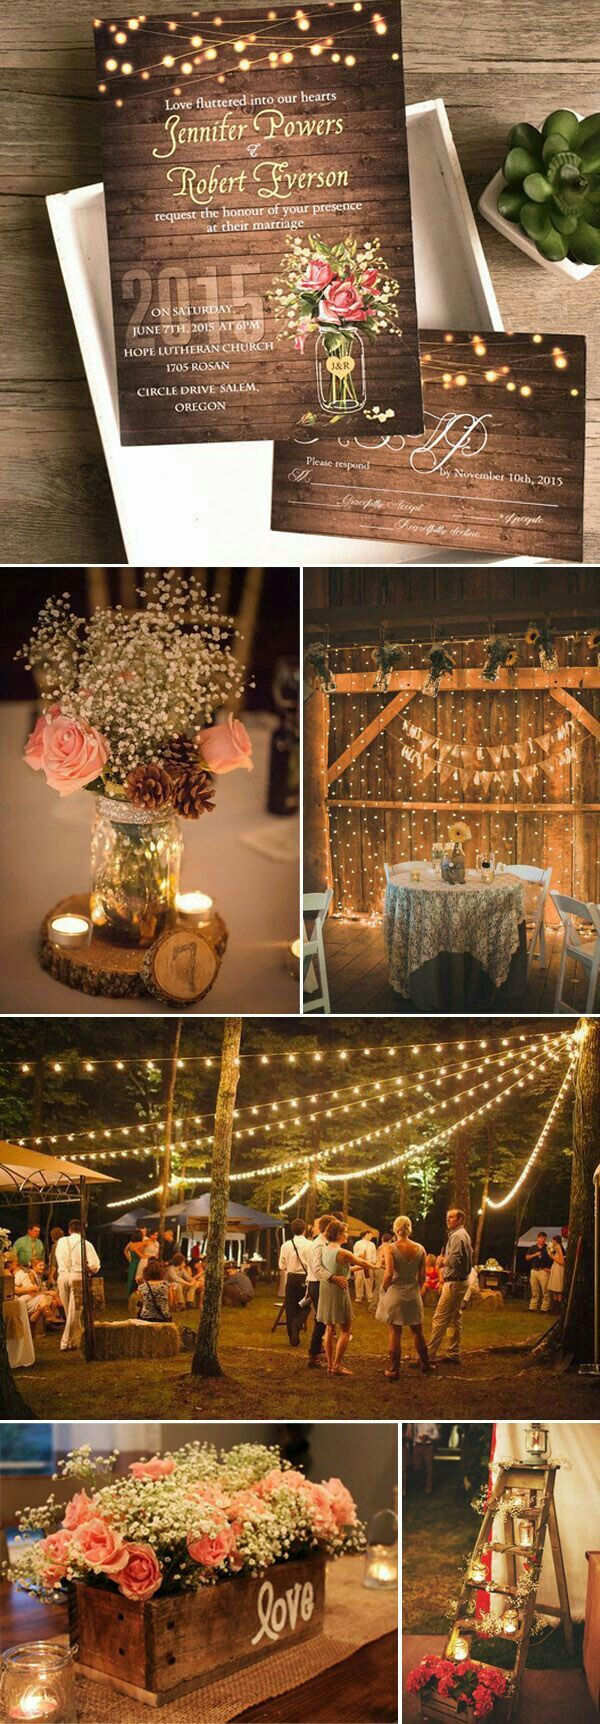 pin by marelize share on wedding pinterest wedding weddings